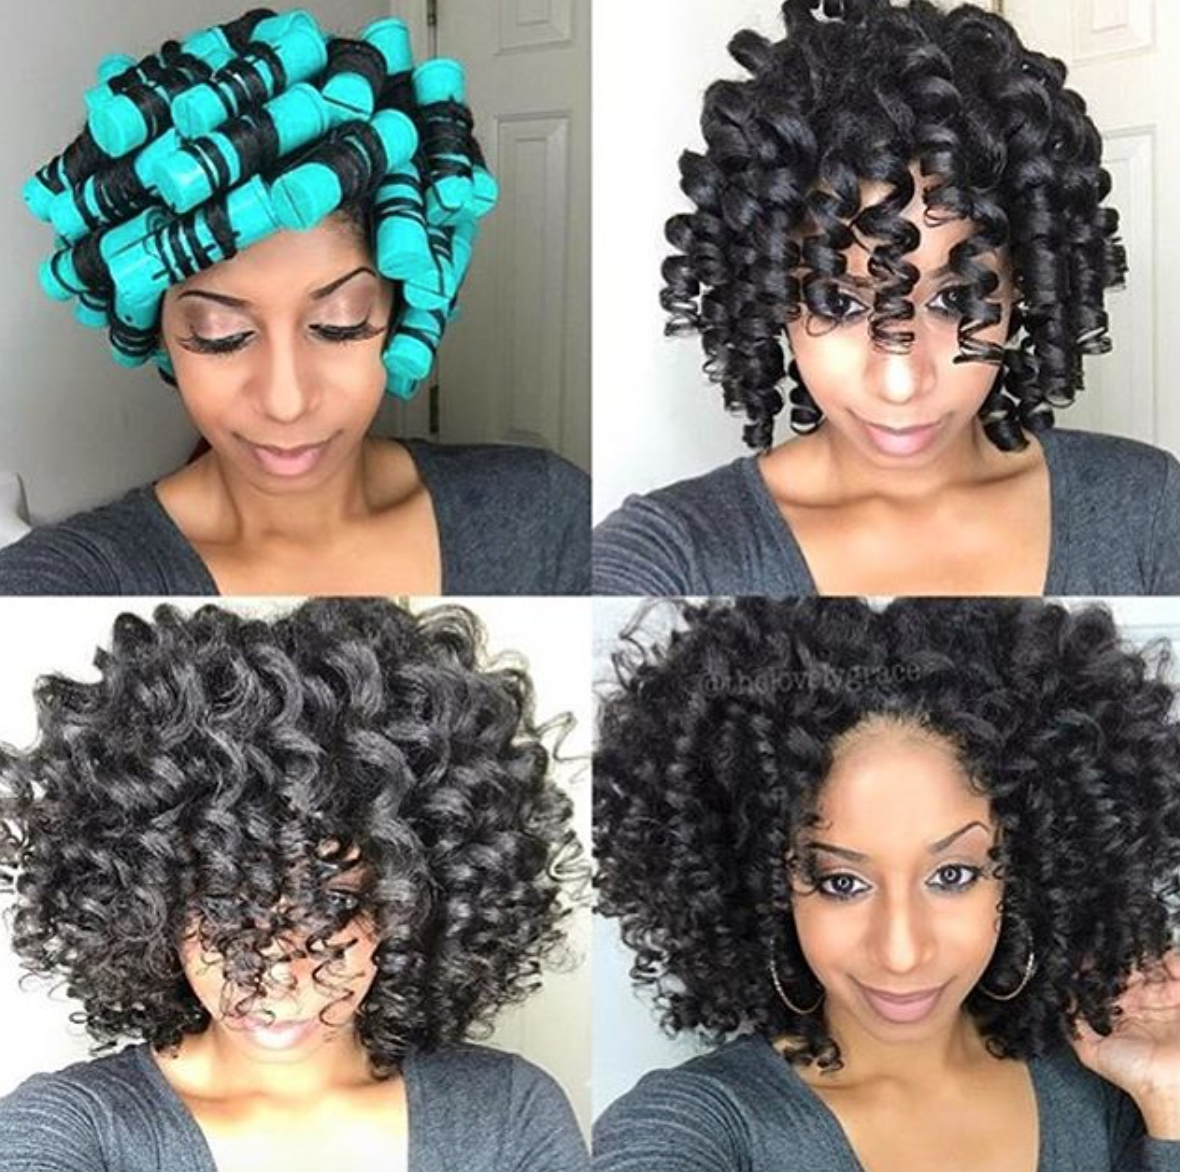 Backgrounds black hair roller set styles of styles for mobile full hd pics gorgeous curls thelovelygrace httpsblackhairinformationcom